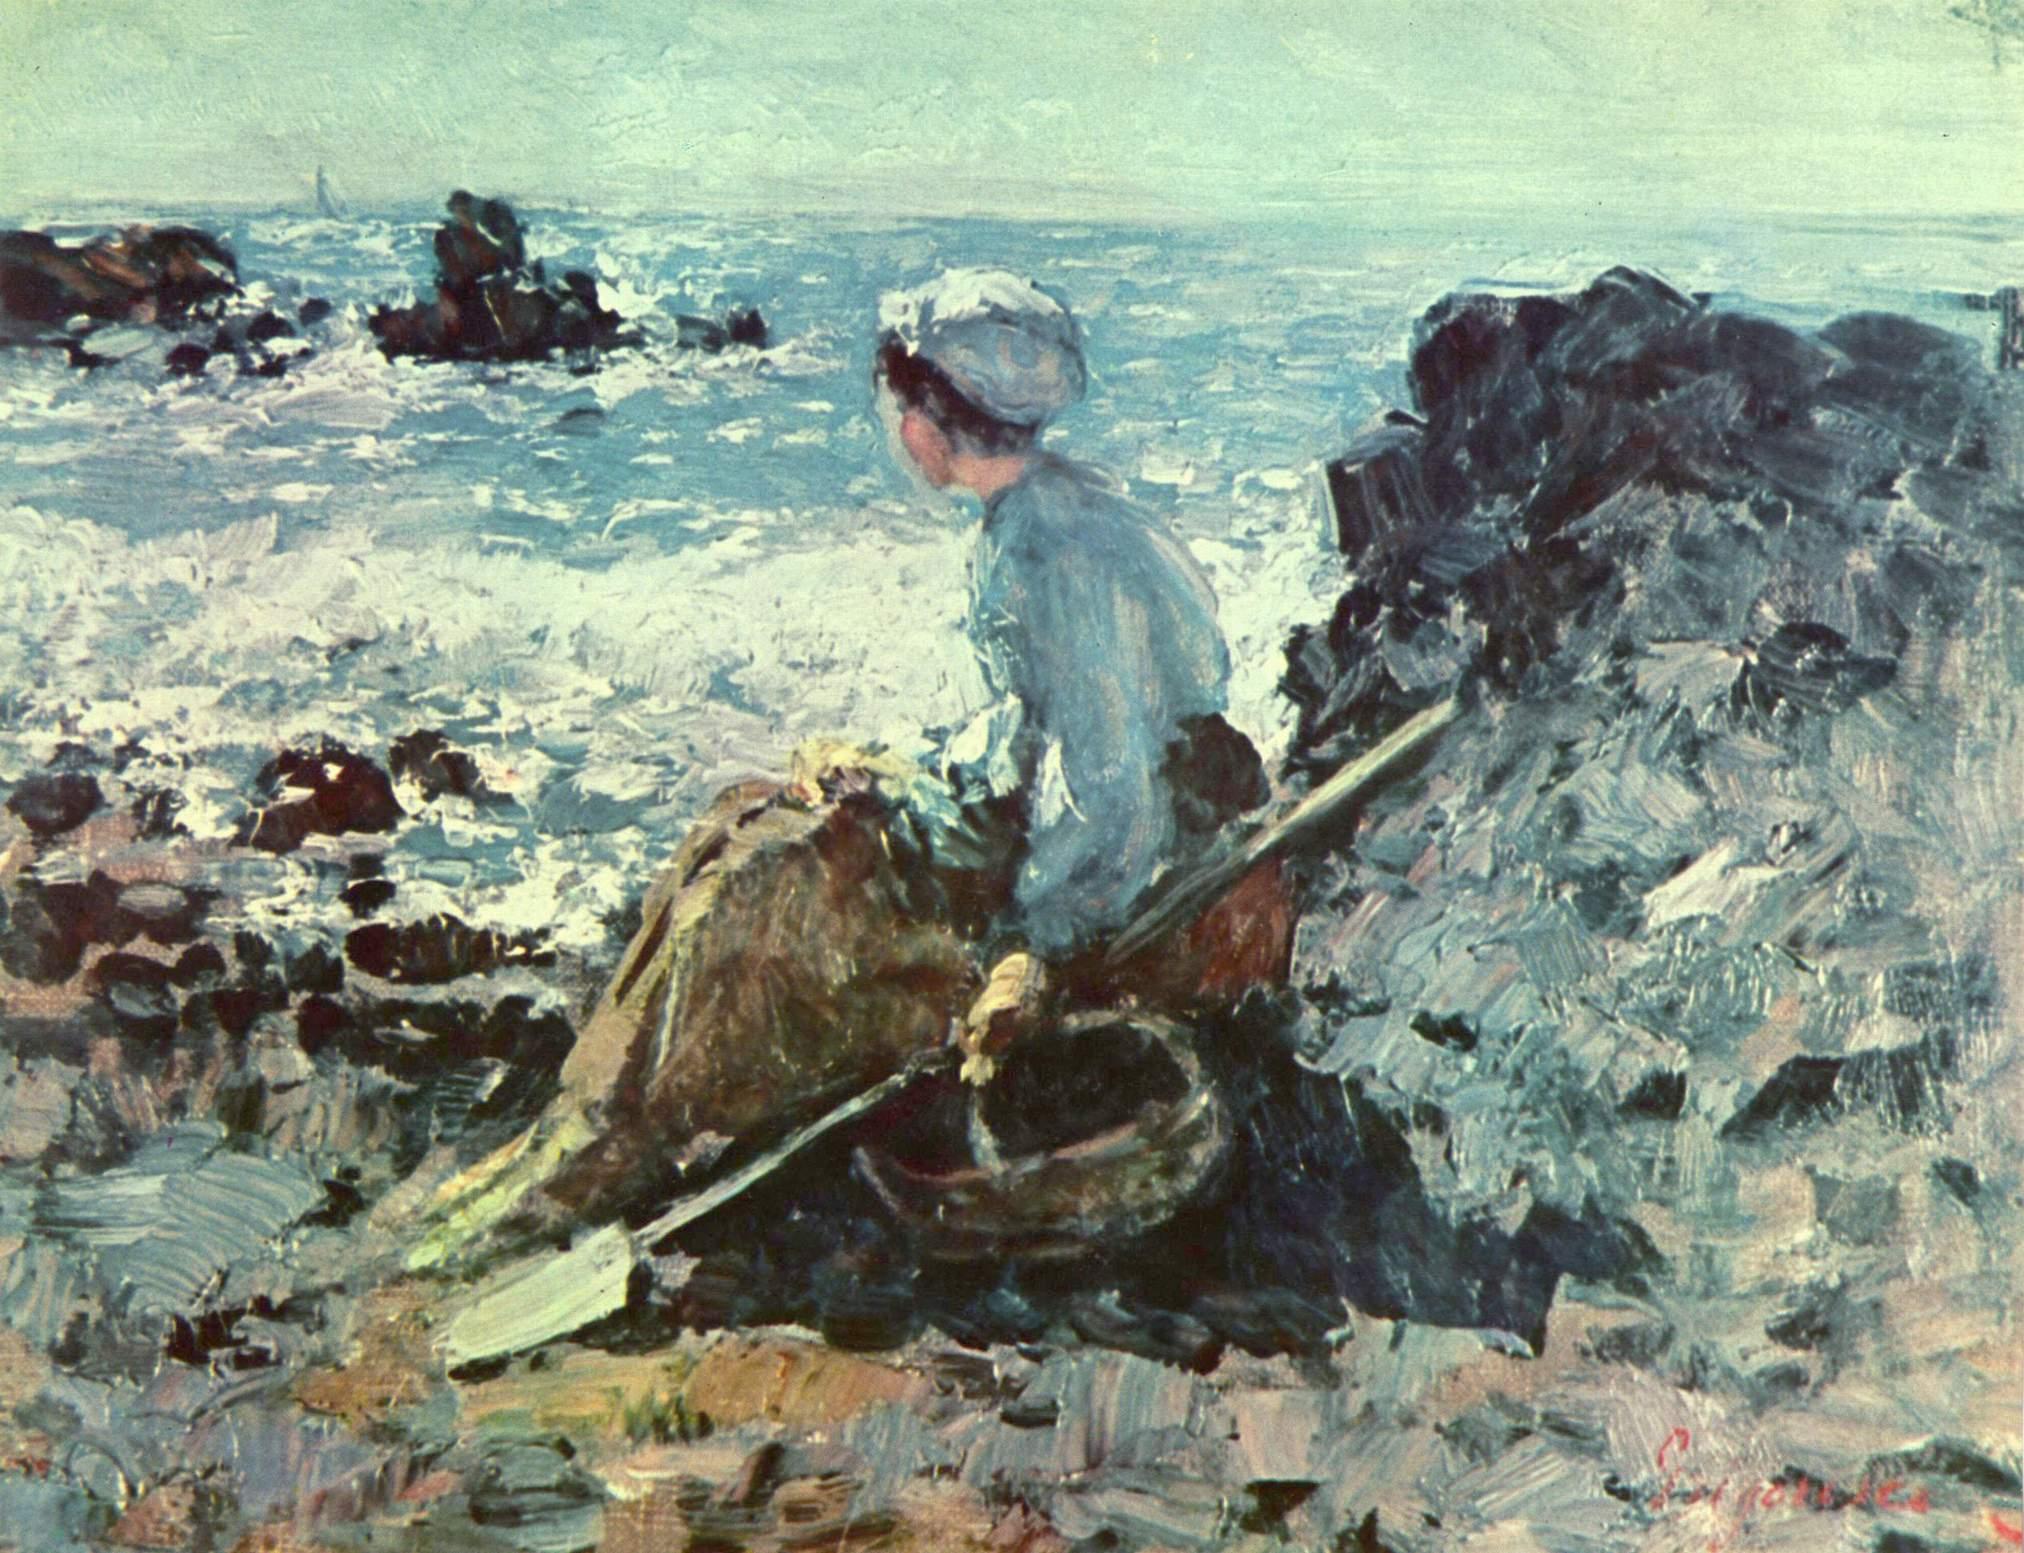 Original file      2 024   215  1 553 pixels  file size  378 KB  MIME type    Nicolae Grigorescu Paintings